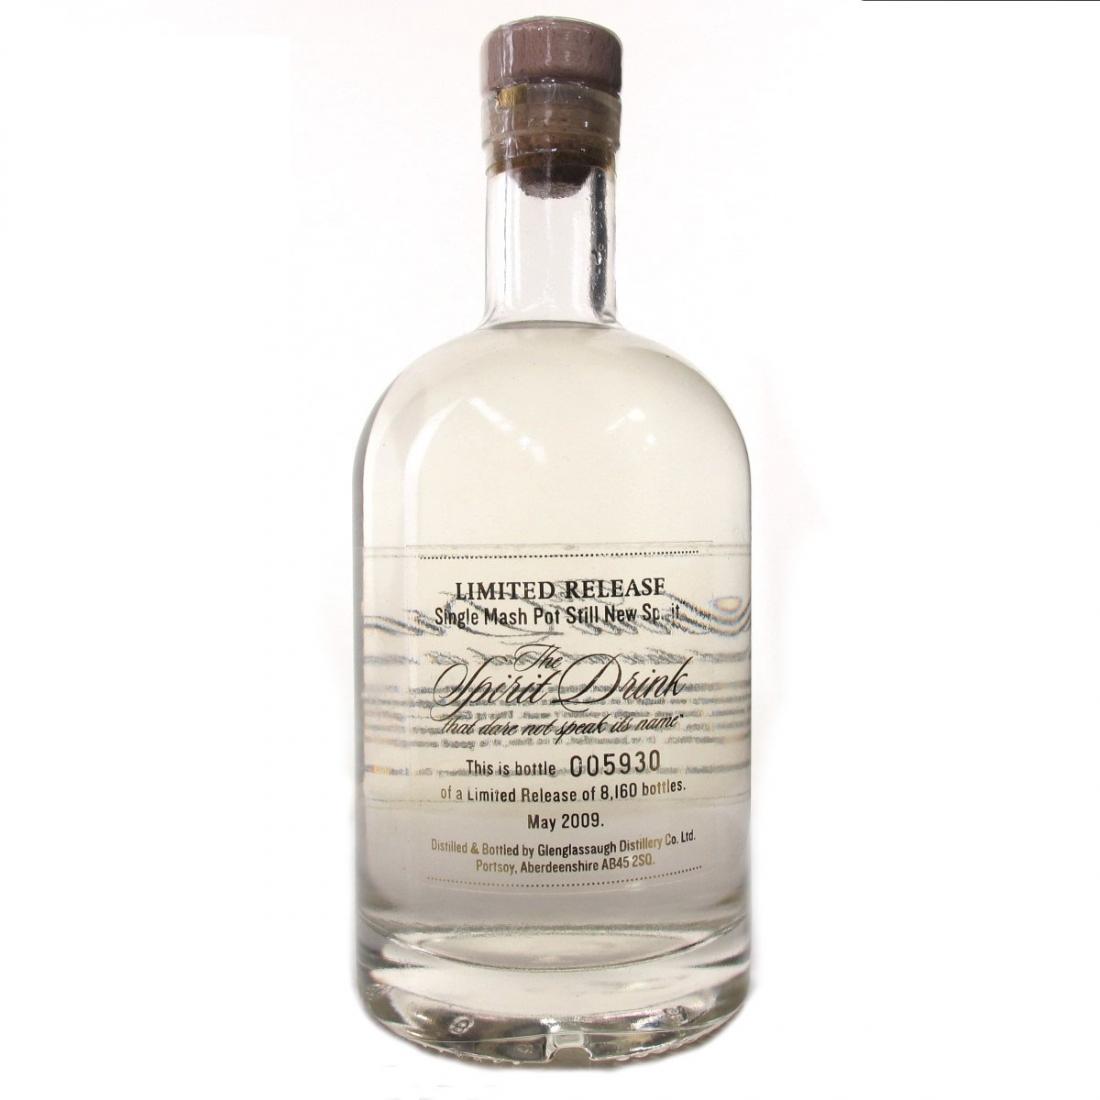 Glenglassaugh New Make Spirit Drink / Limited Release